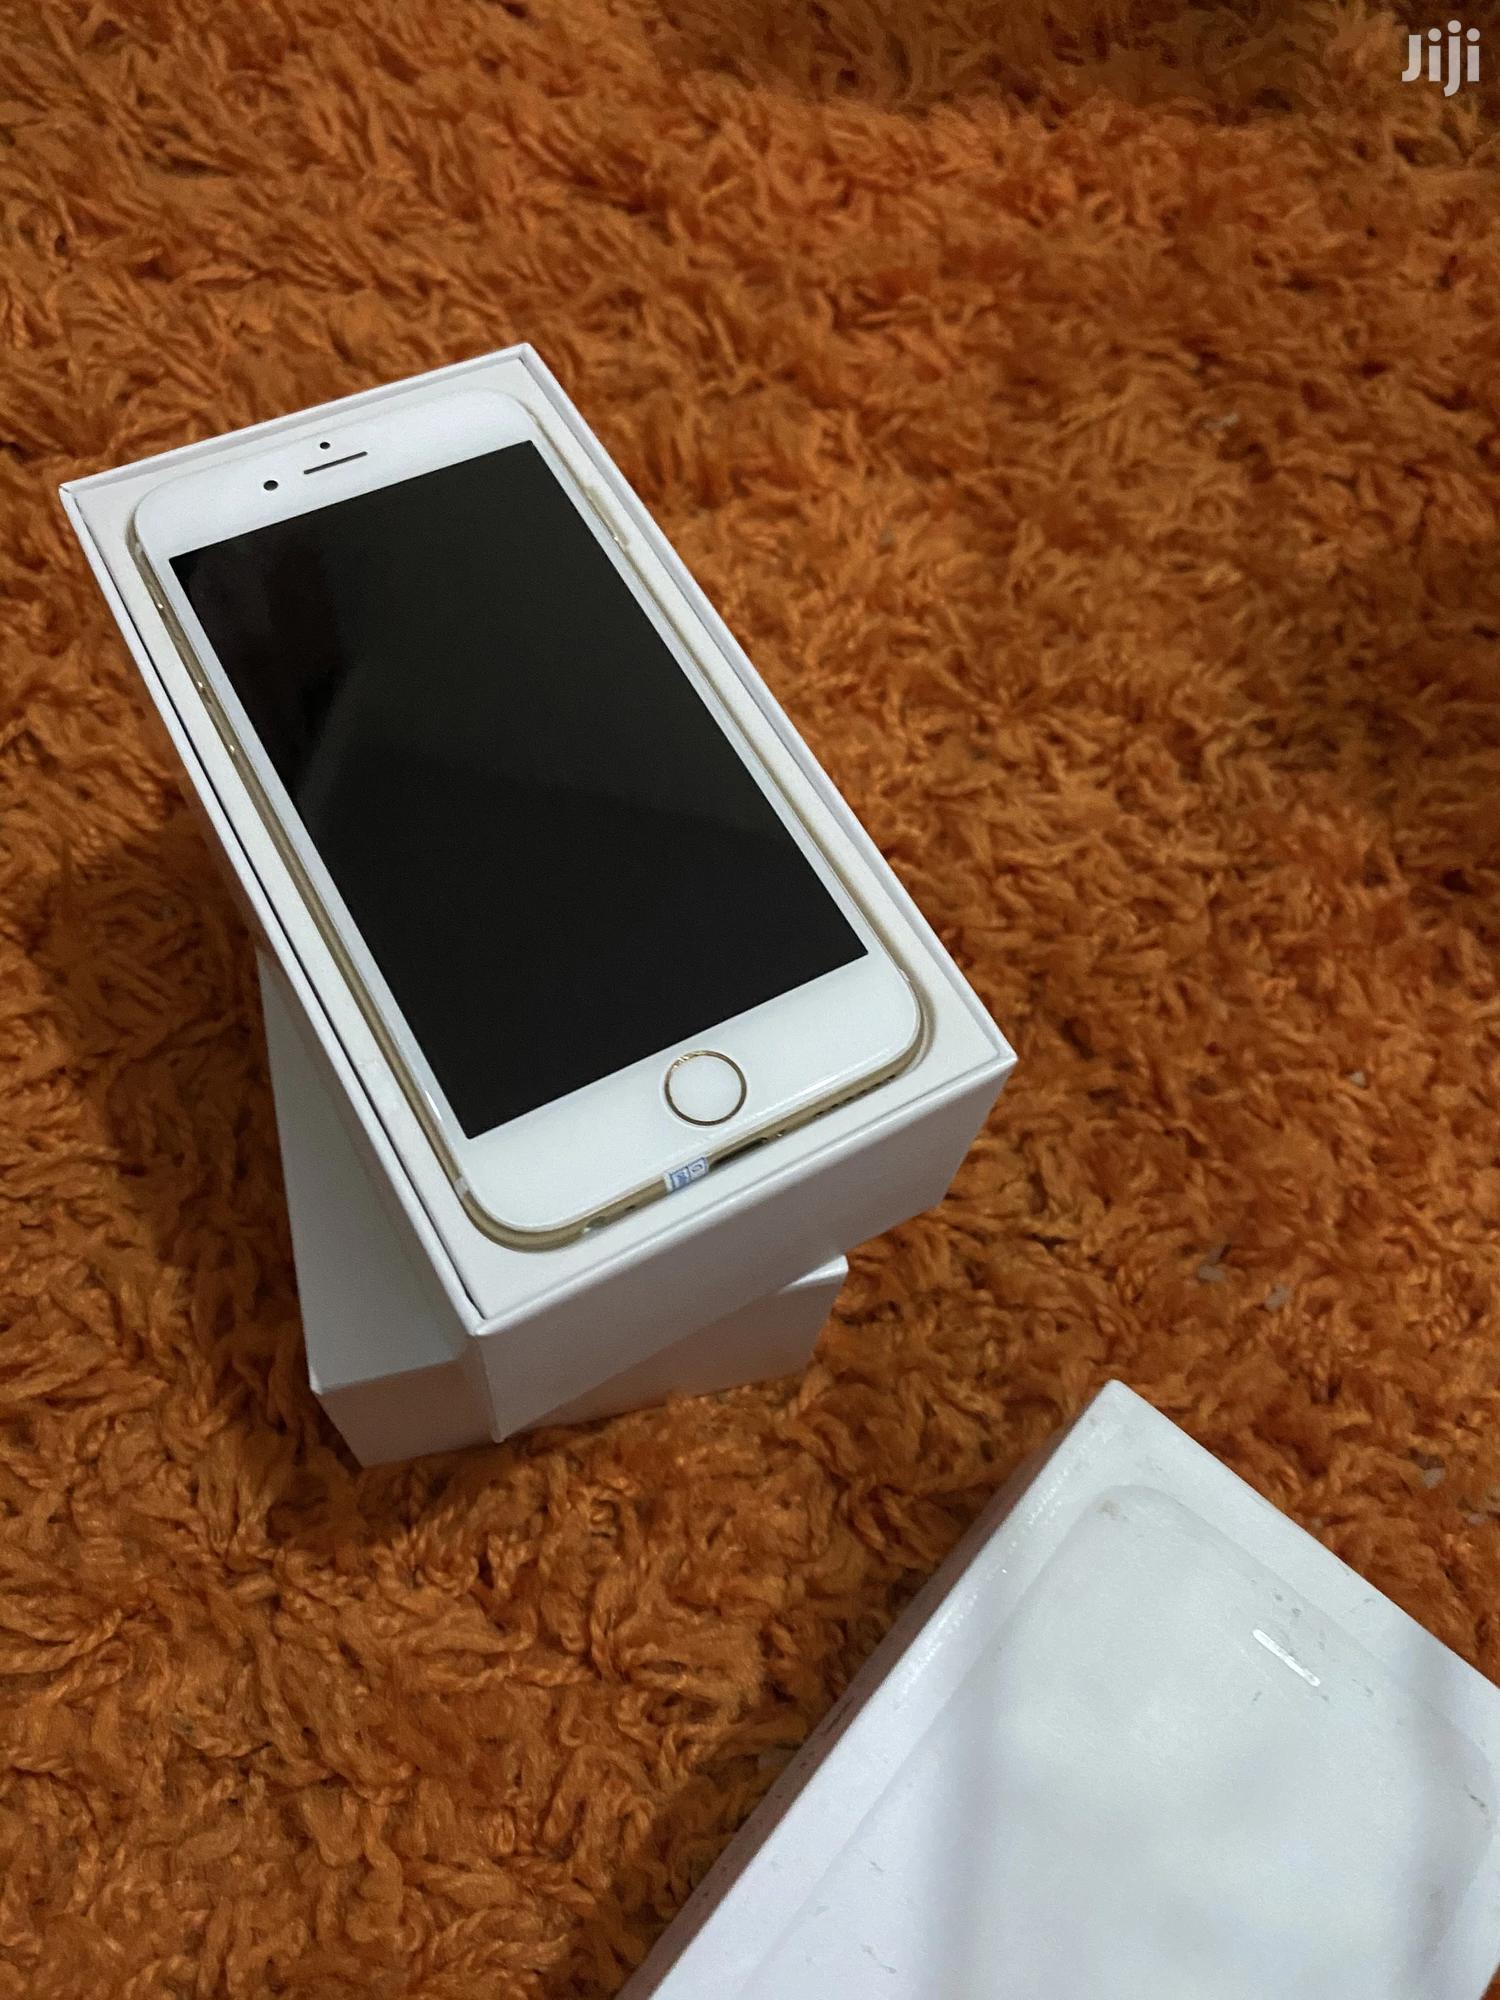 Apple iPhone 6 Plus 16 GB Gold | Mobile Phones for sale in Nairobi Central, Nairobi, Kenya